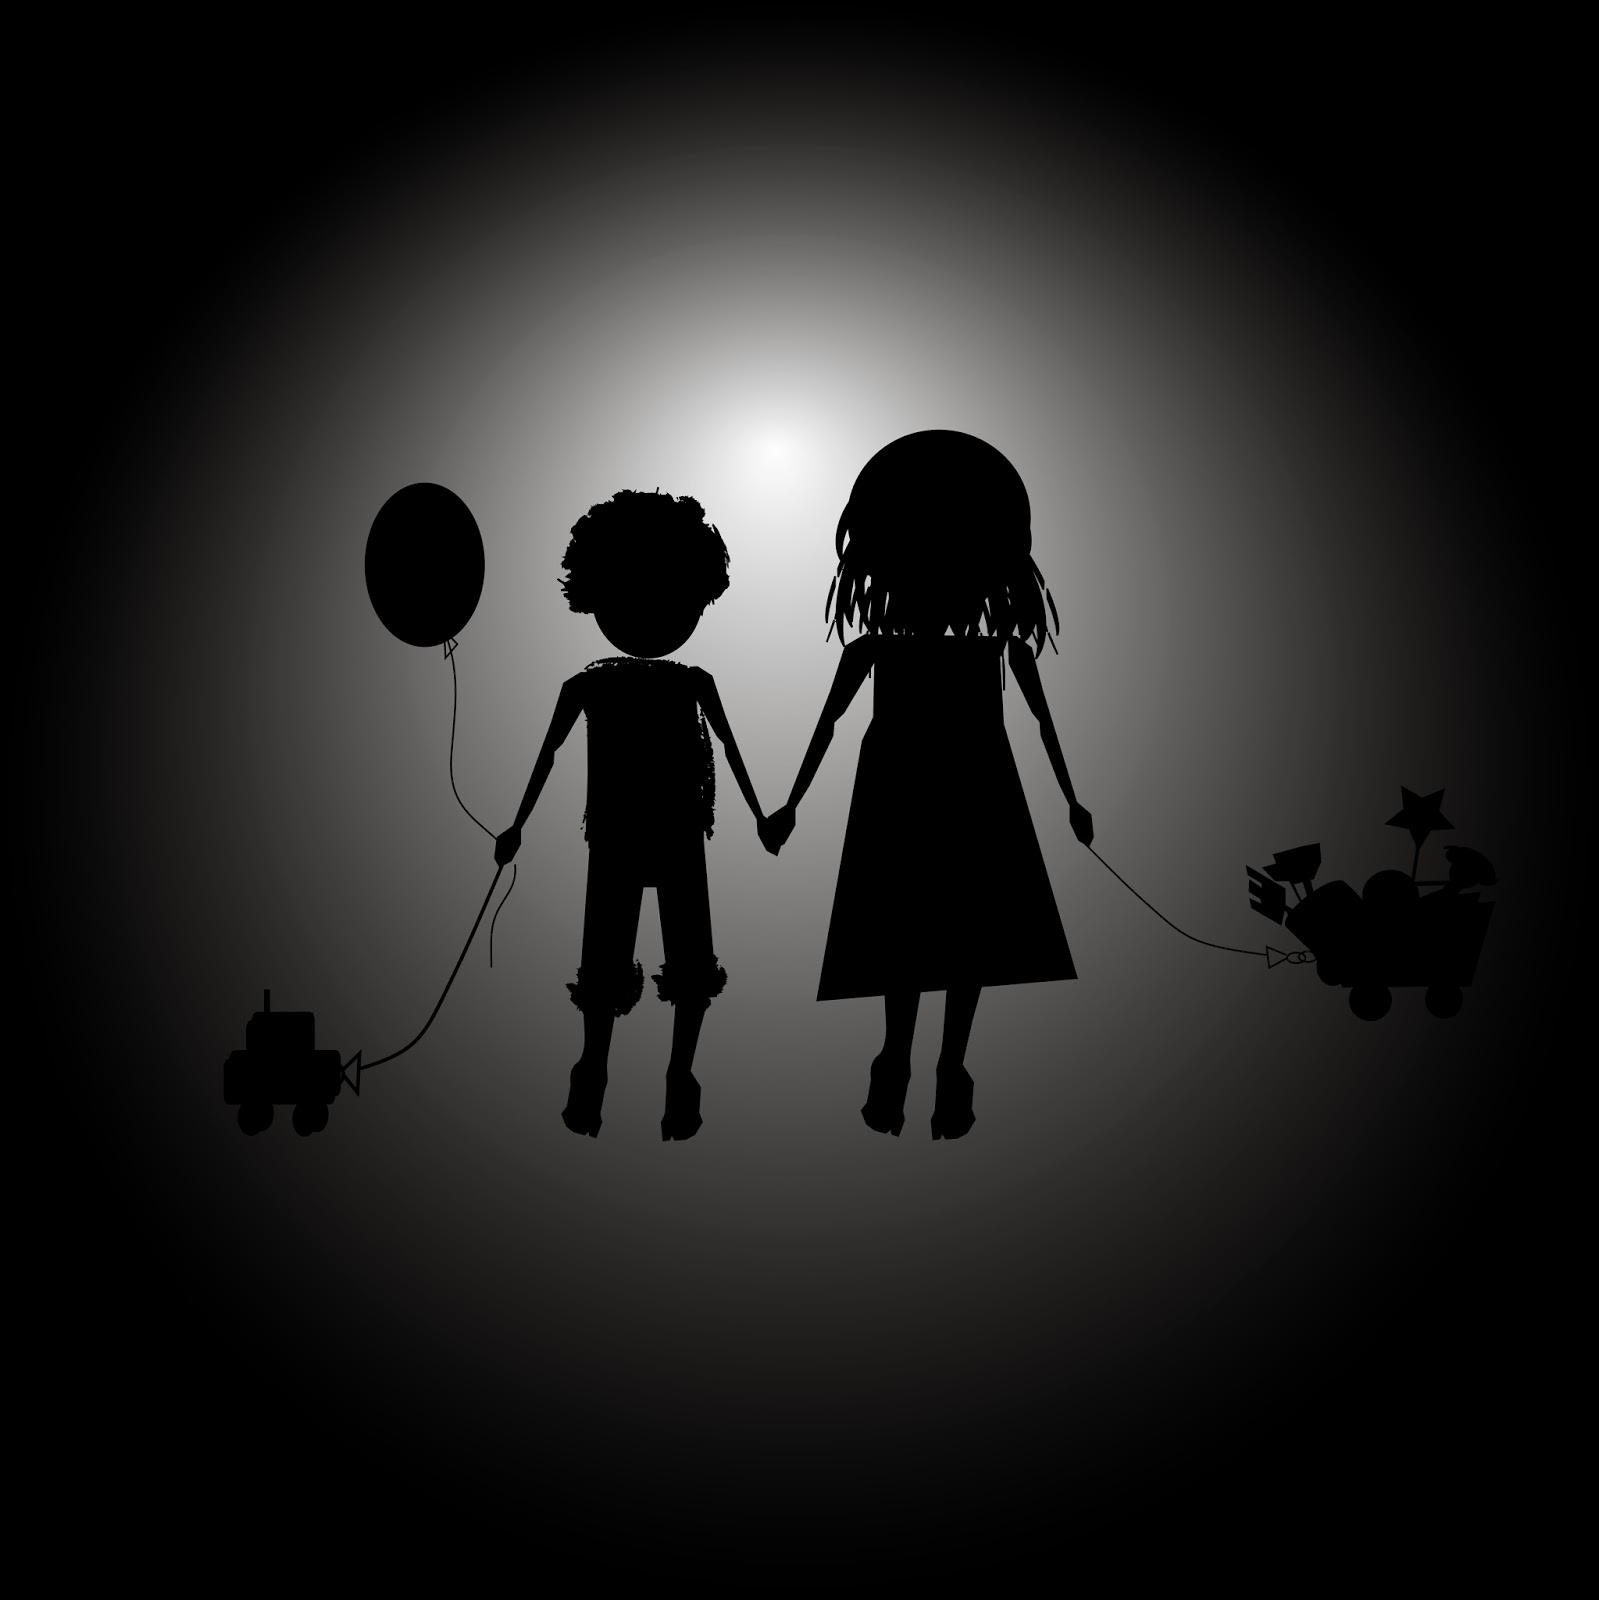 http://www.photoxpress.com/photos-girl-boy-children-1174826?referrer_id=Xj9qdHIQyb7etVXie4irtPQ9xtZobSzz